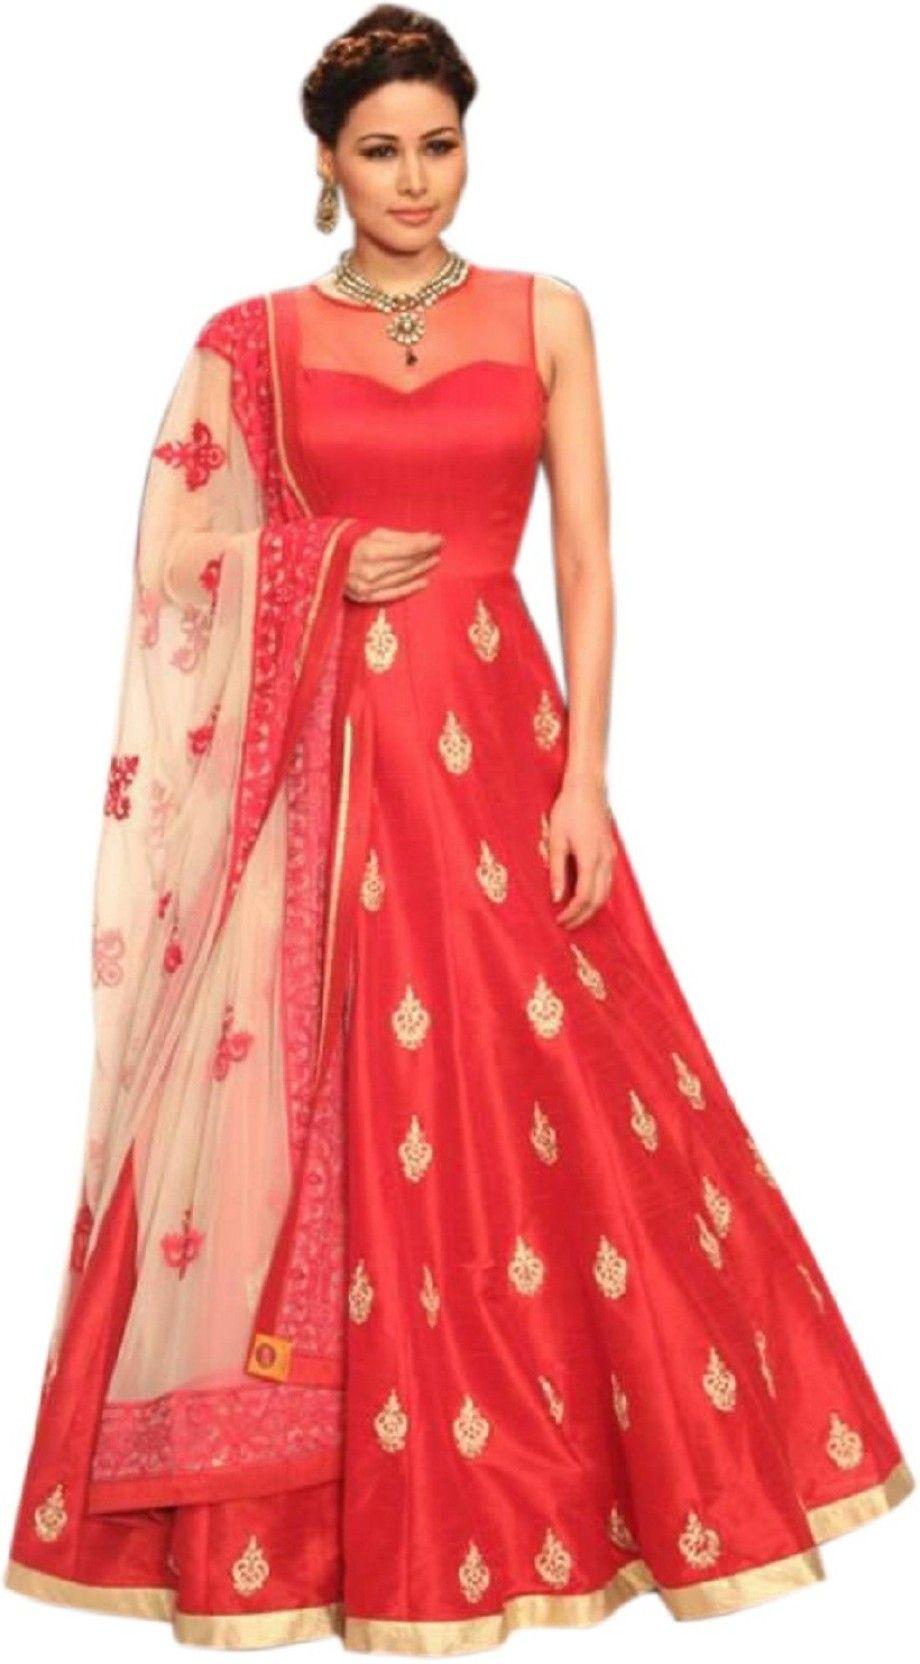 7985f391d3 Aika Anarkali Price in India - Buy Aika Anarkali online at Flipkart.com